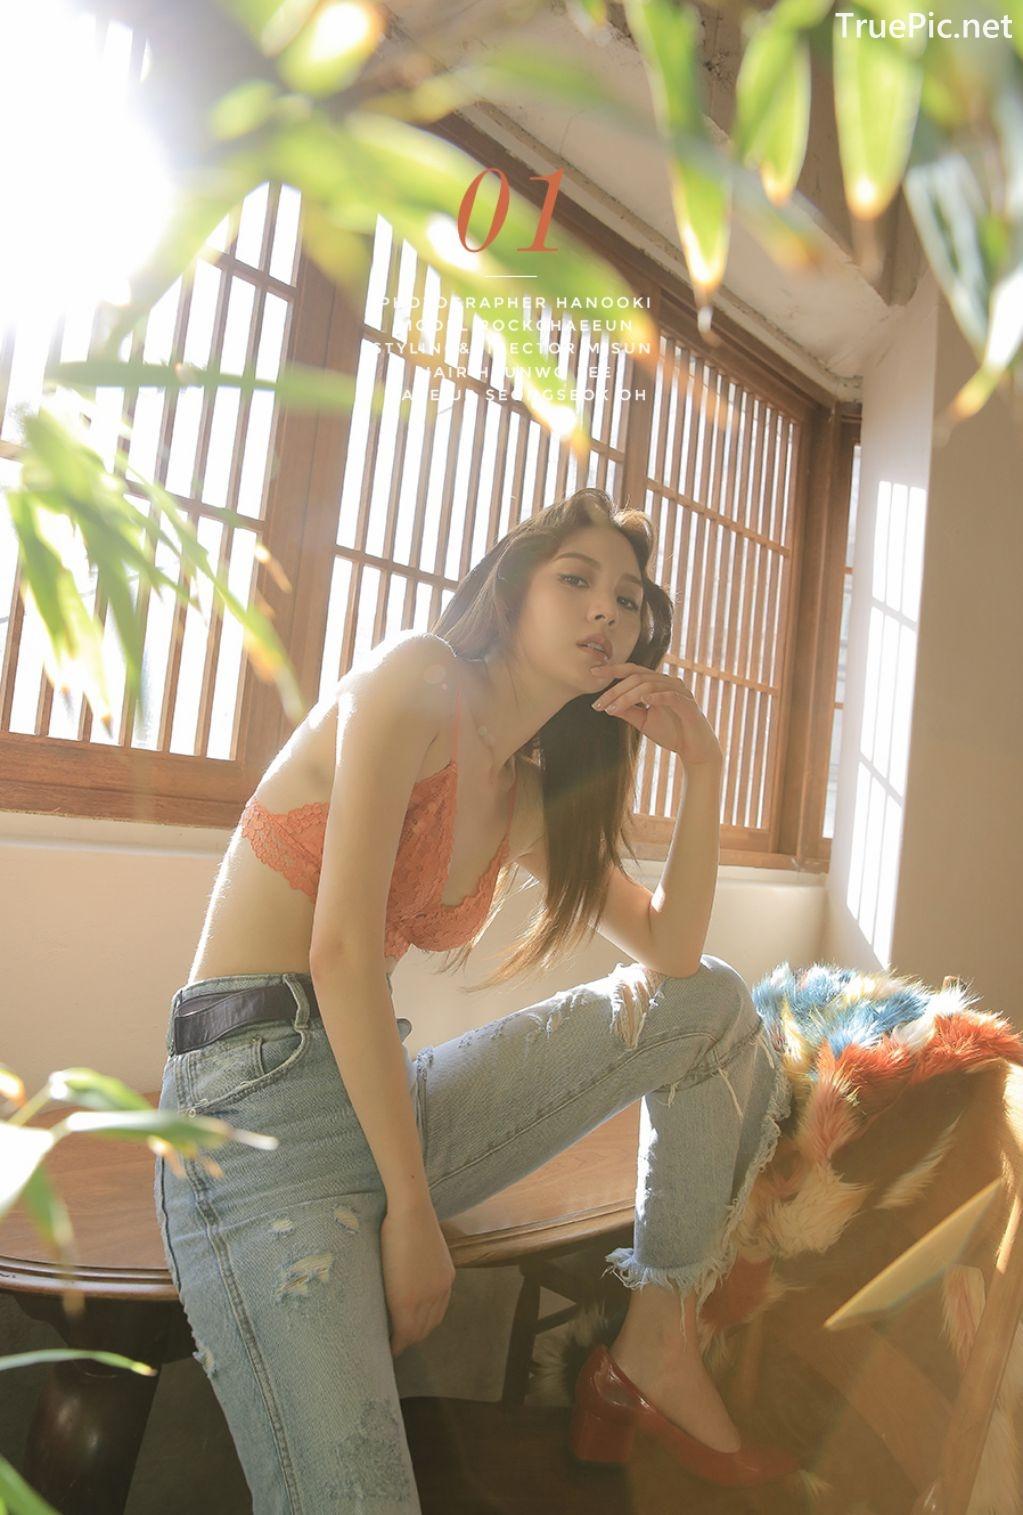 Image-Korean-Fashion-Model-Lee-Chae-Eun-7-Lingerie-Set-For-A-Week-TruePic.net- Picture-4